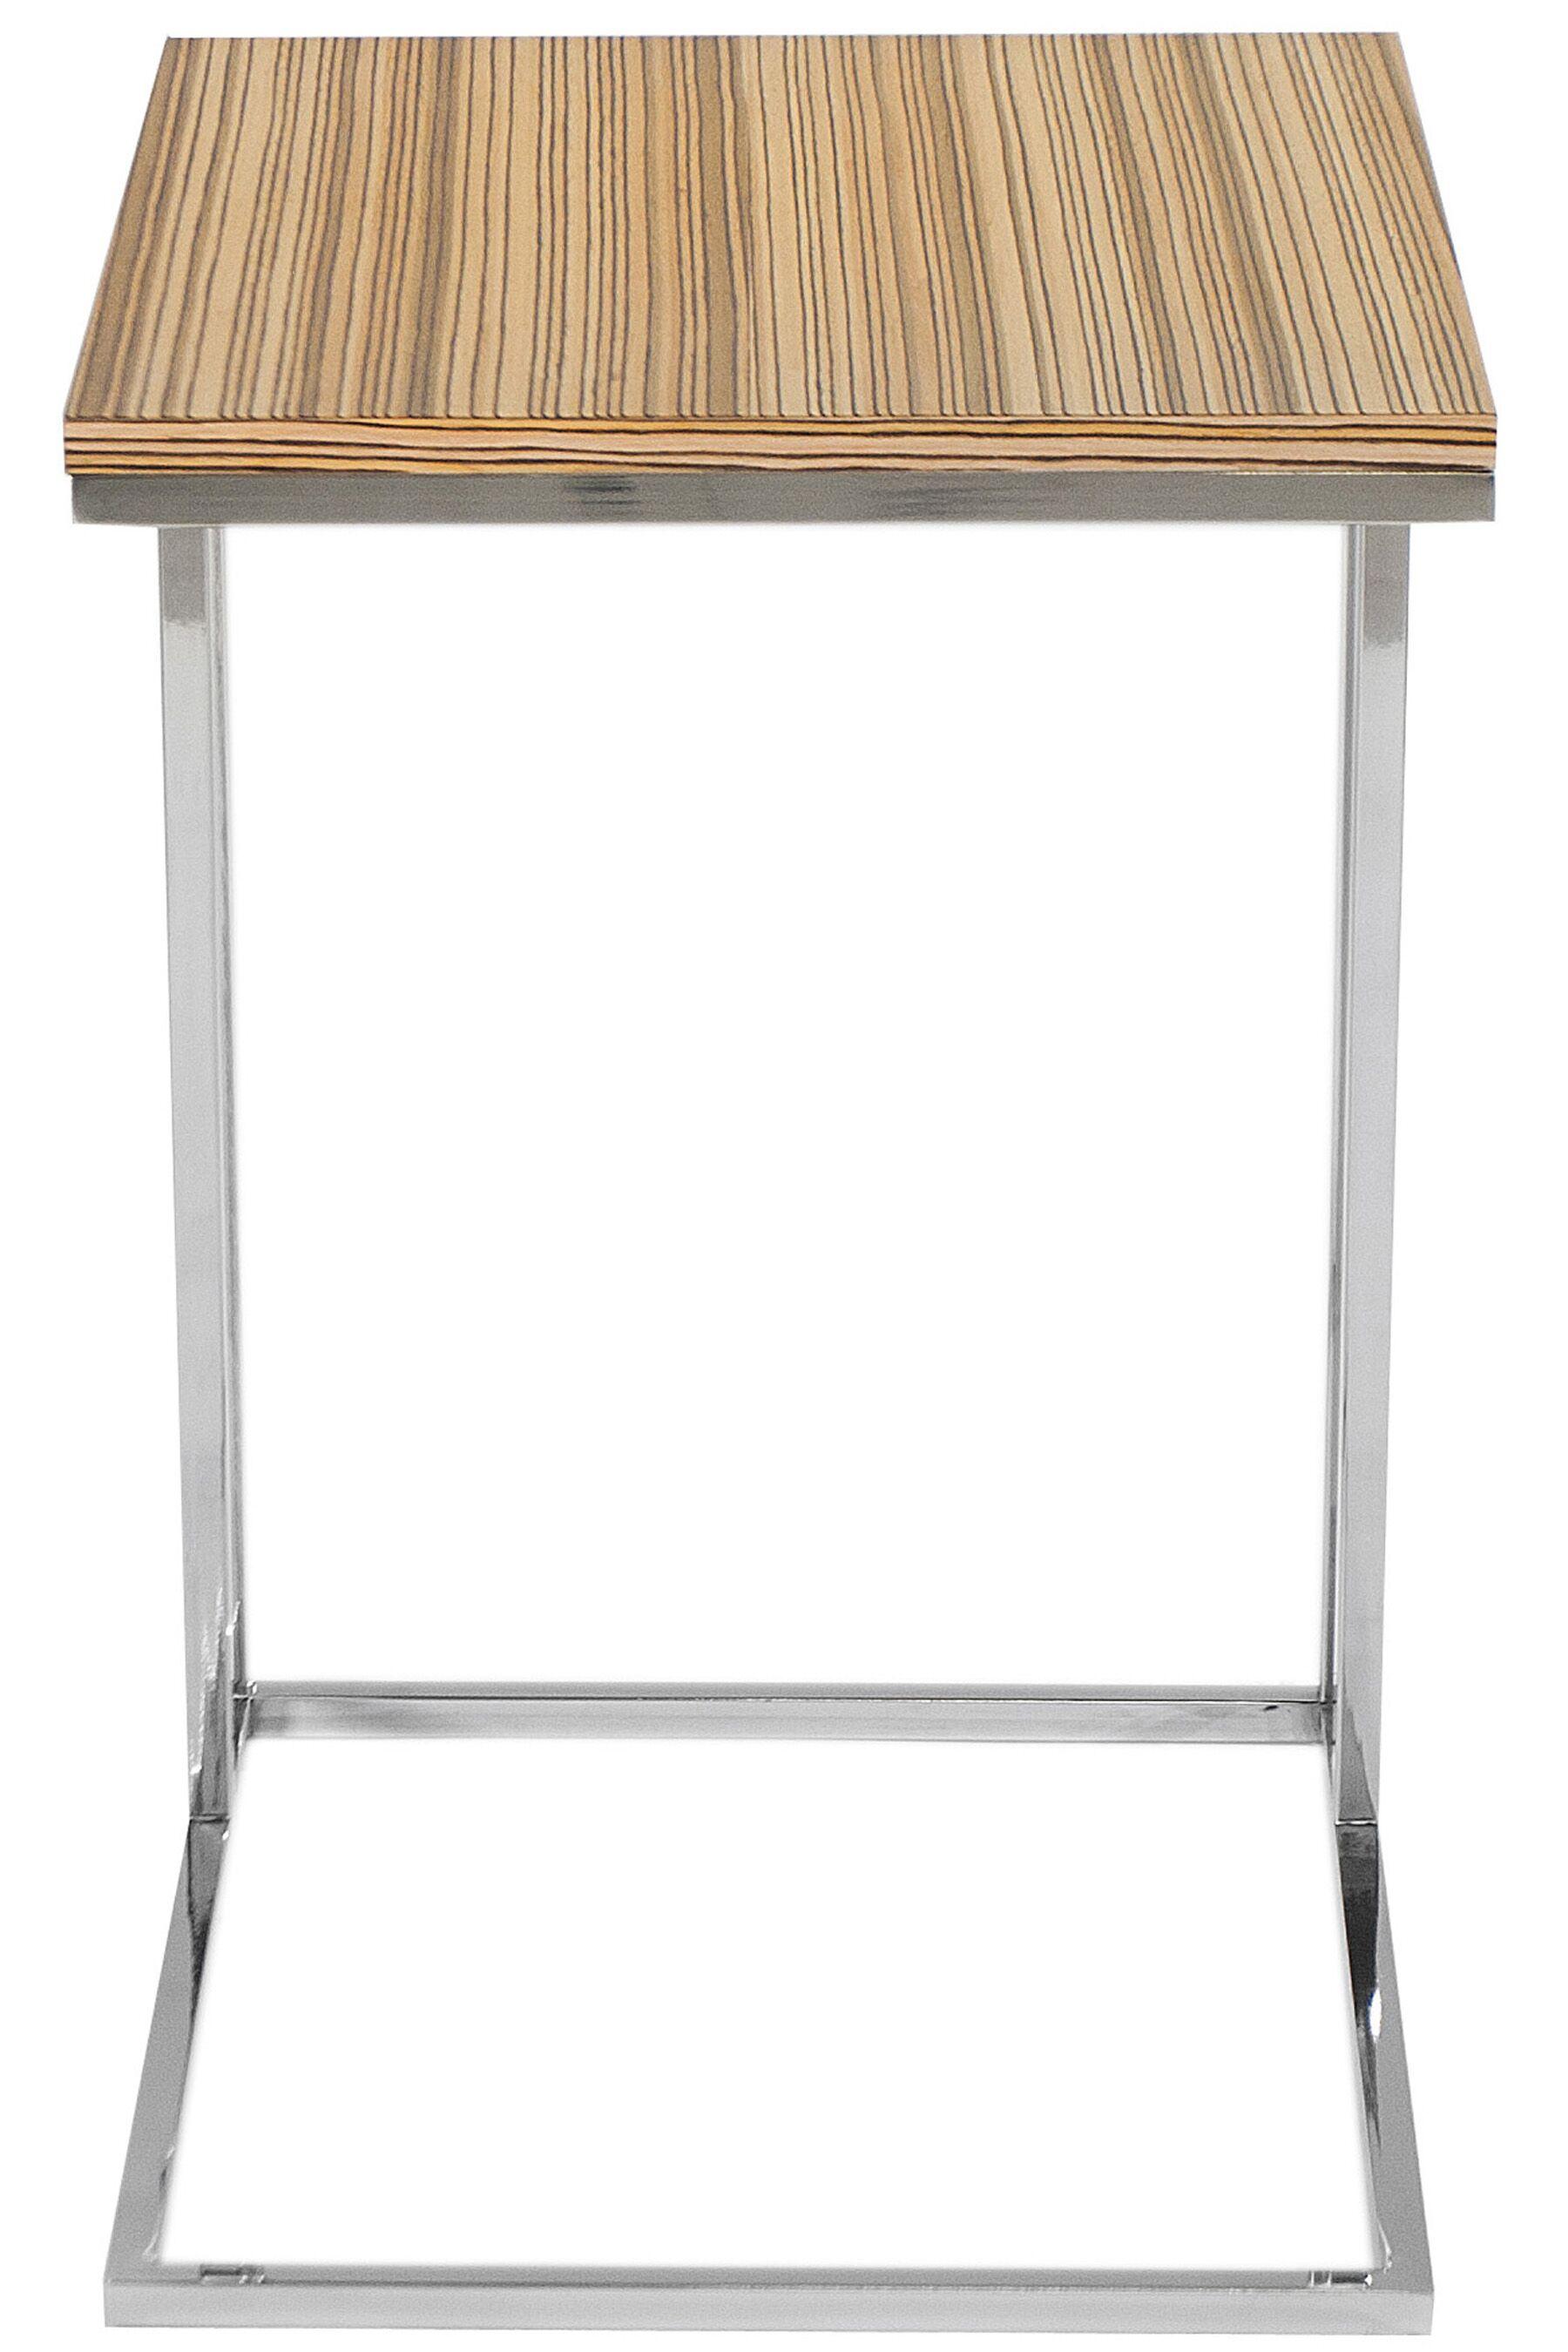 Cashin End Table Table Base Color: Silver, Table Top Color: Walnut